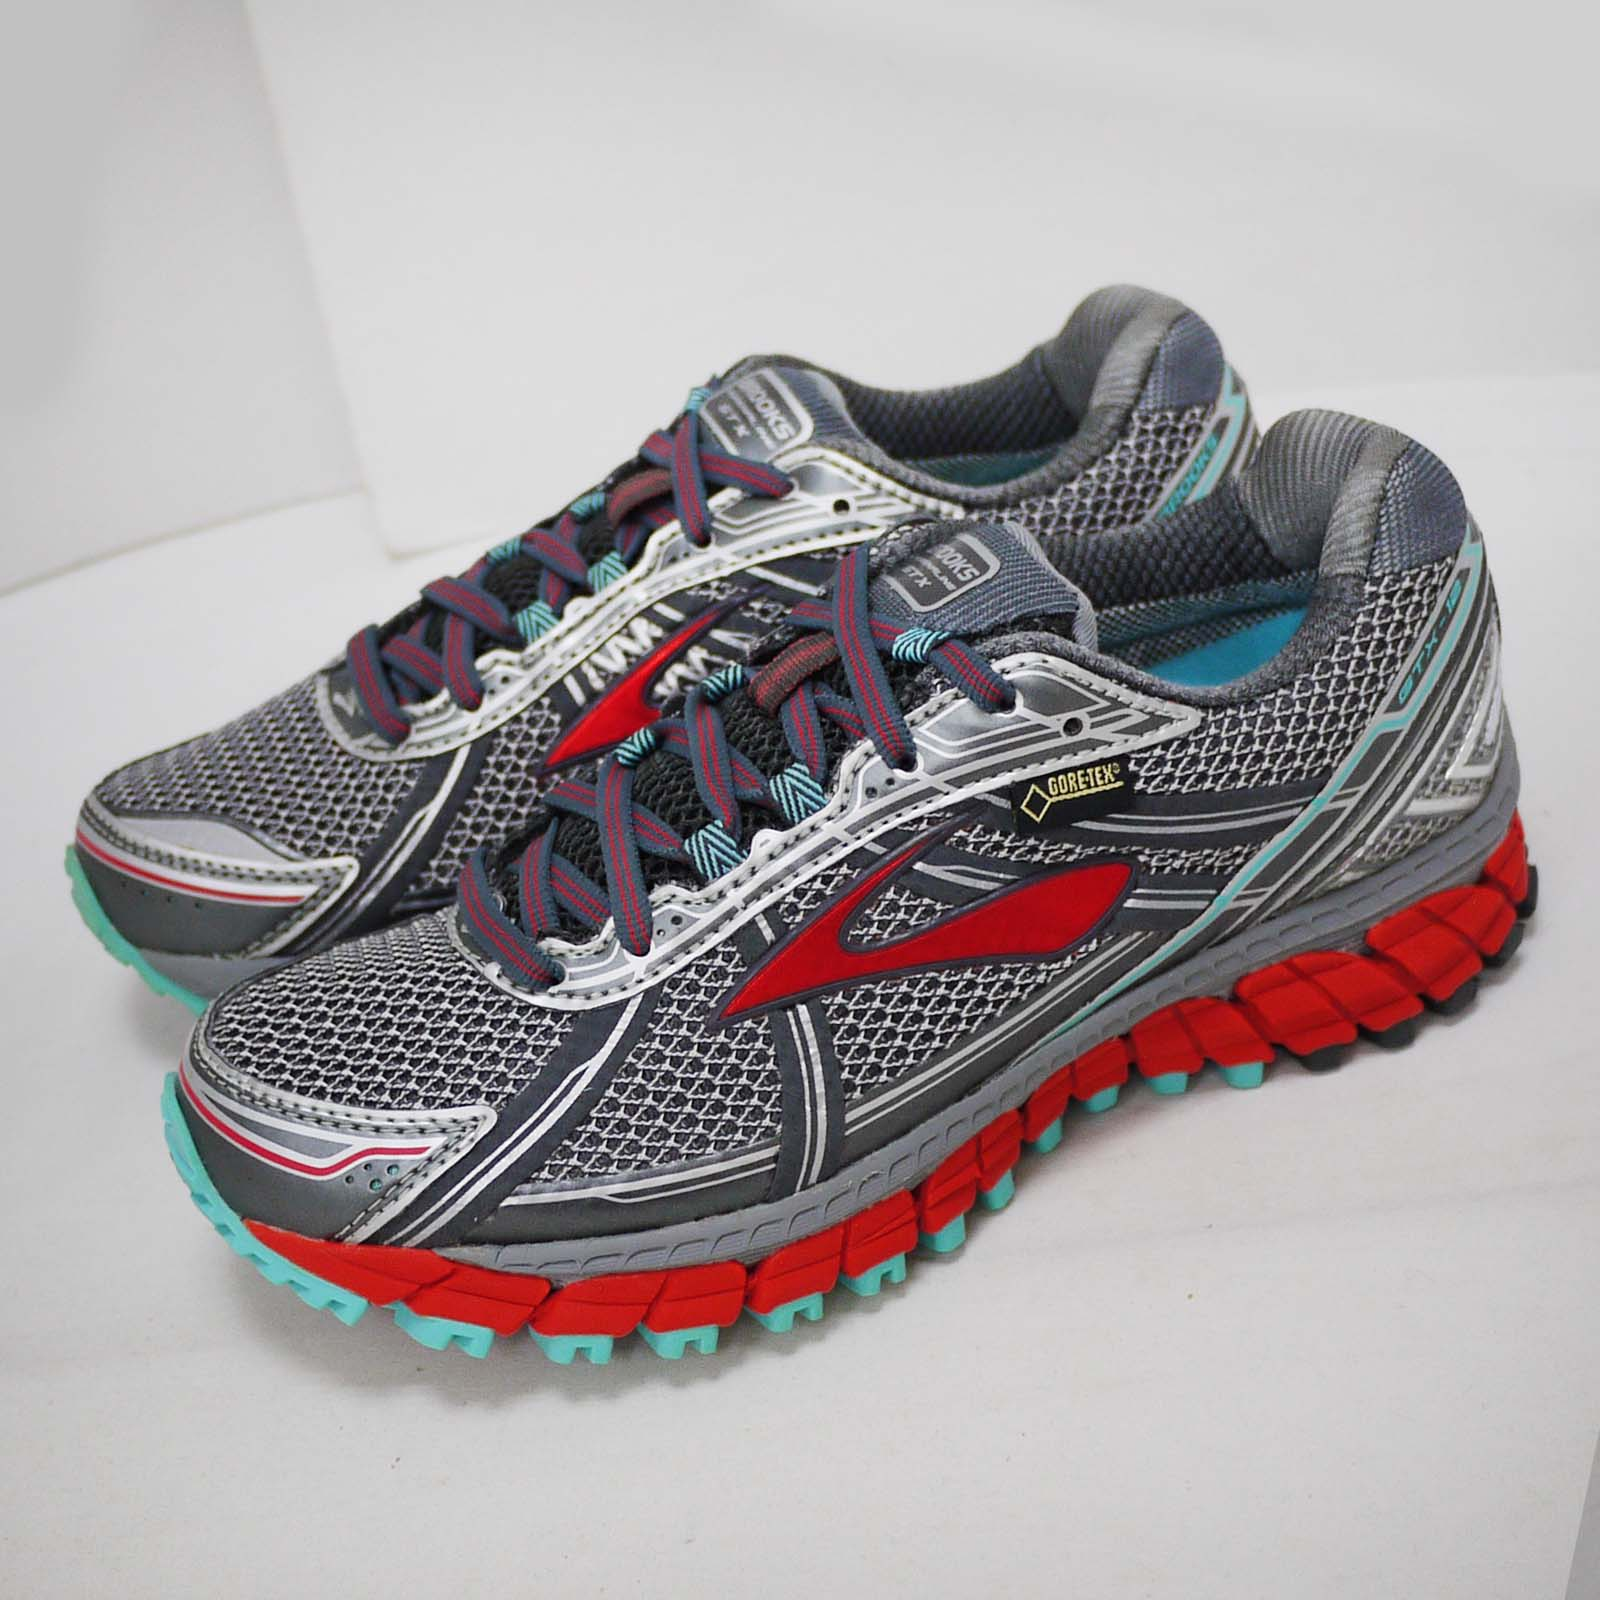 5c1dca1113e64 Details about Brooks Adrenaline ASR 12 GTX Right Foot With Discoloration  Women Shoes 120189 1B